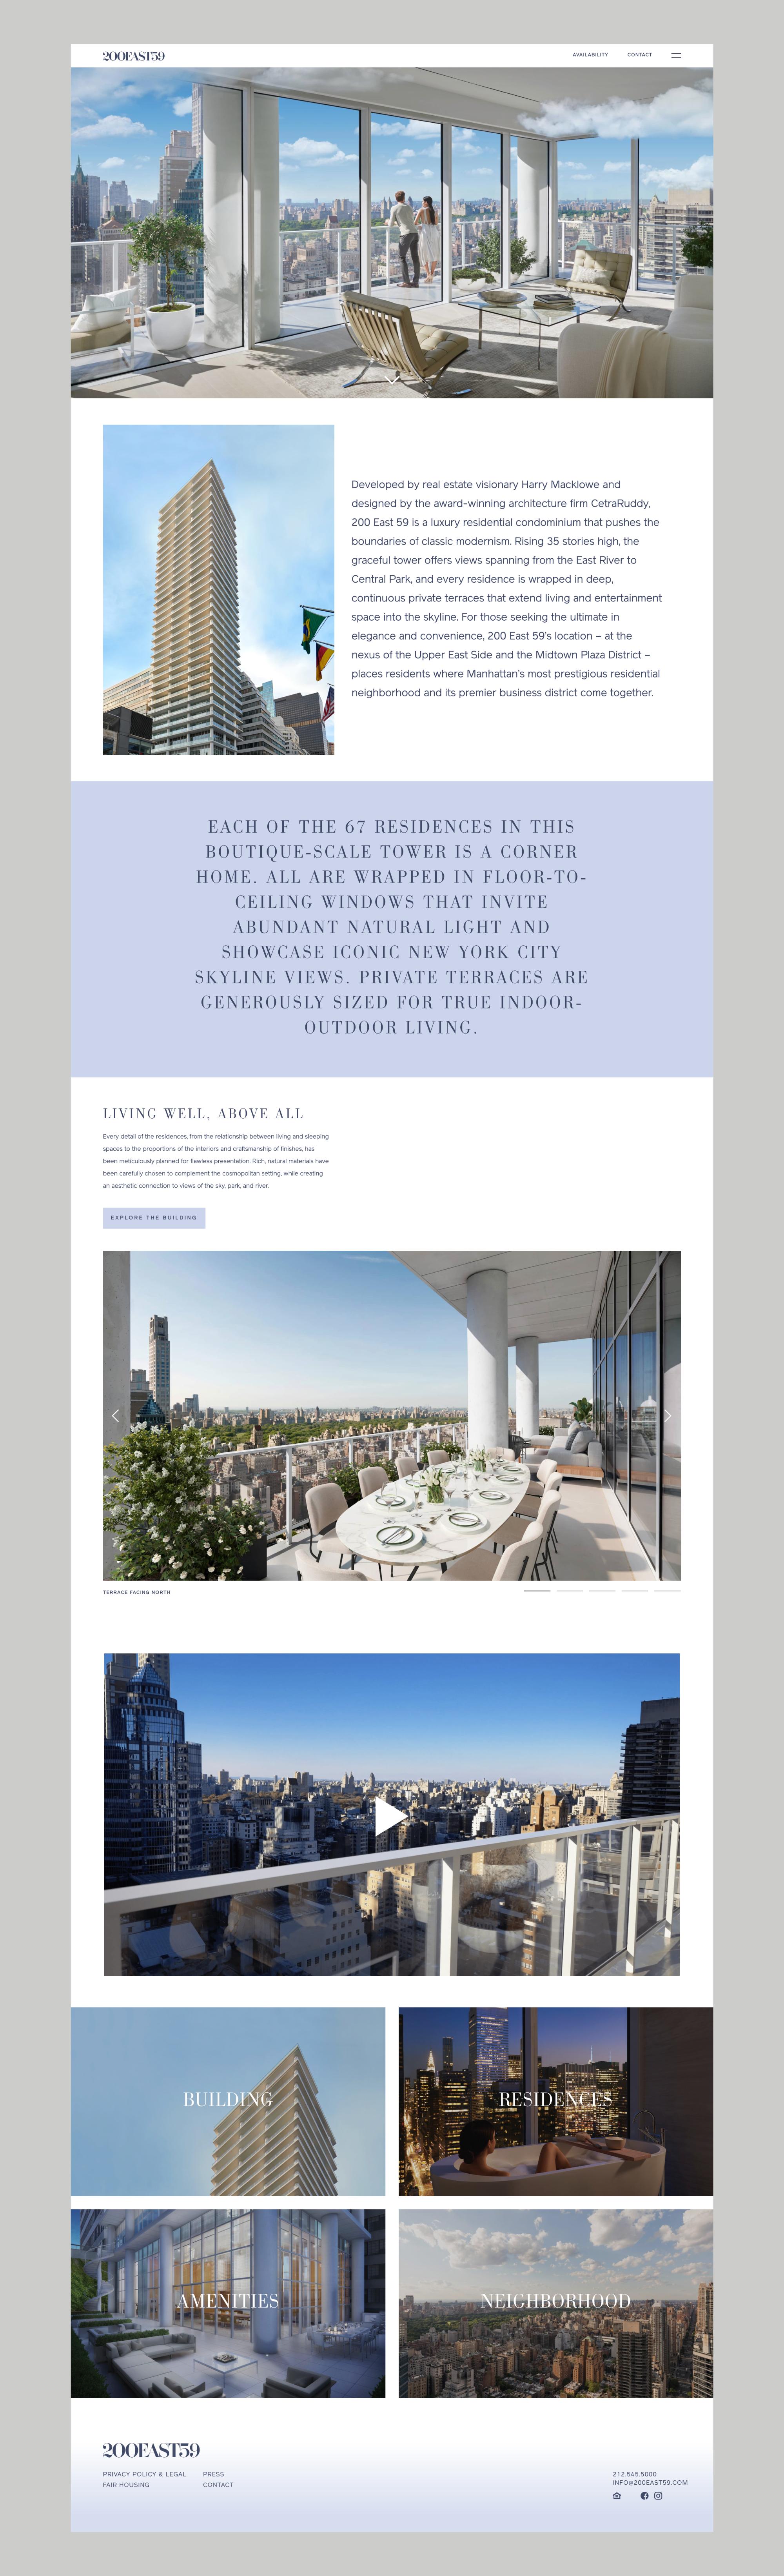 homepage-full3